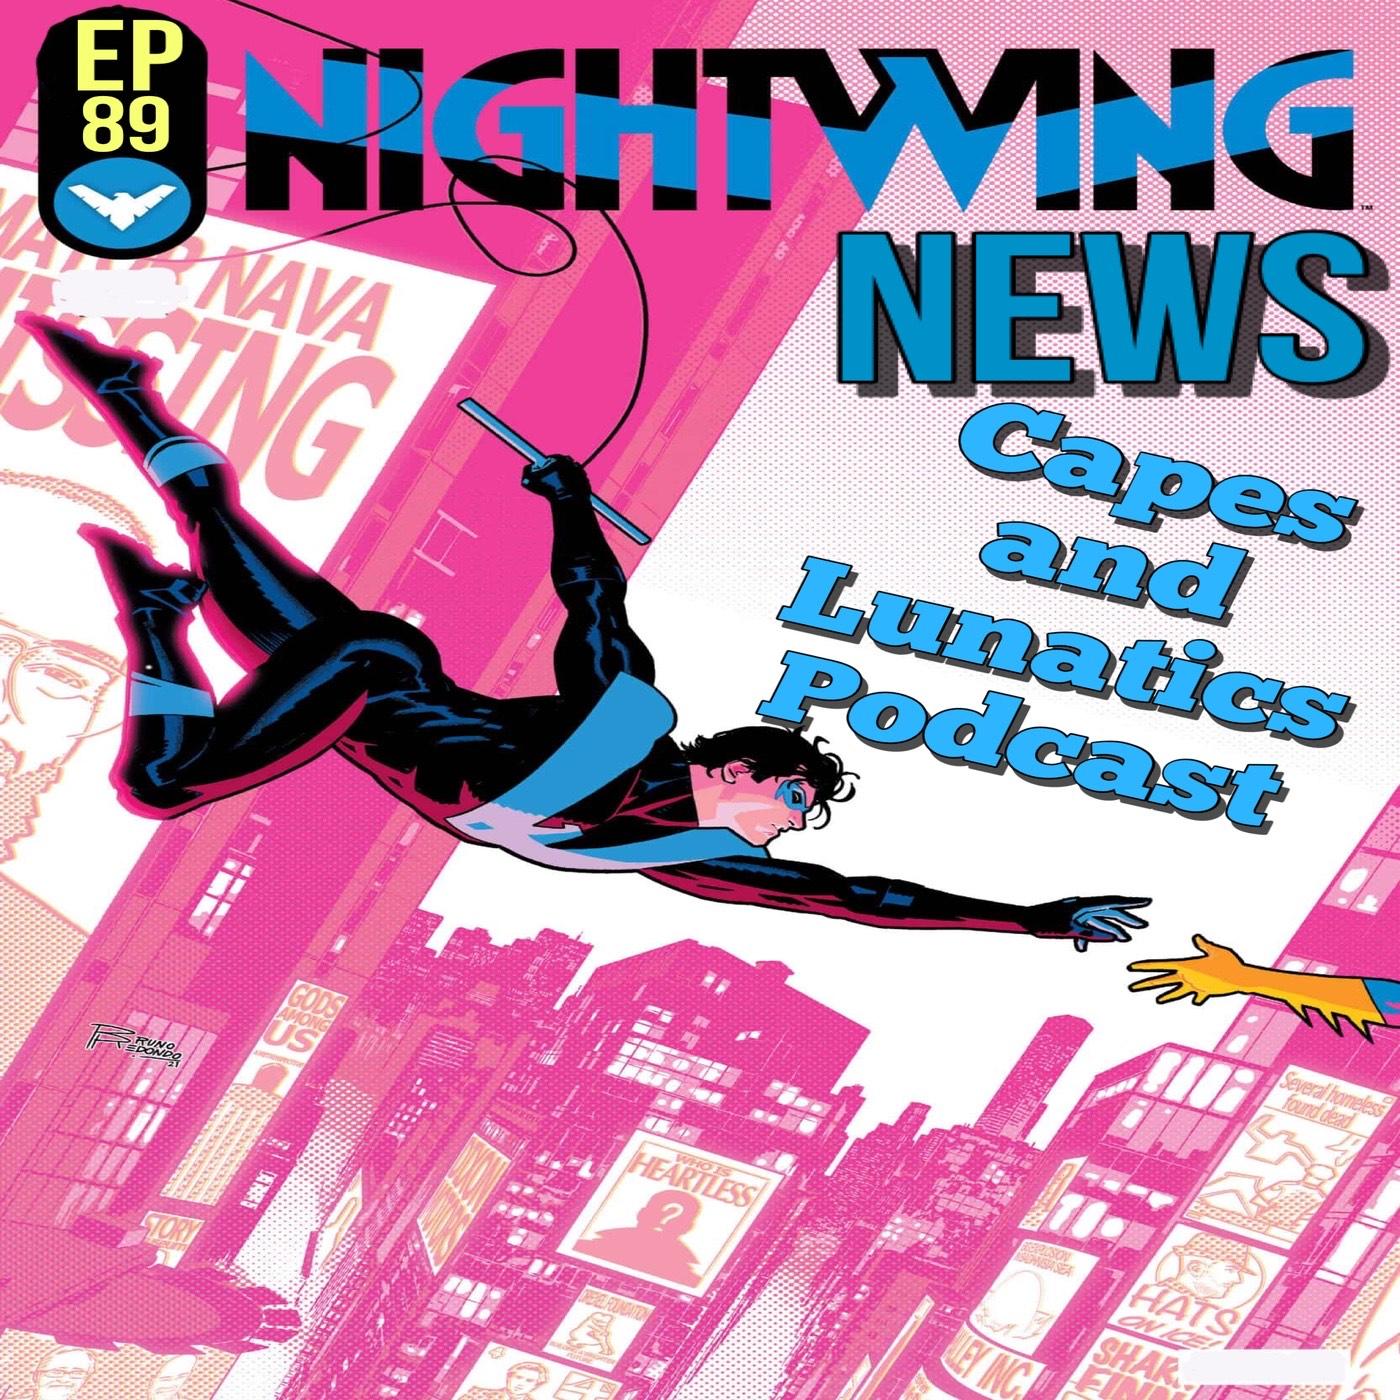 Nightwing News Ep #89: Nightwing #79 (NEW) & Nightwing #52 (2001)